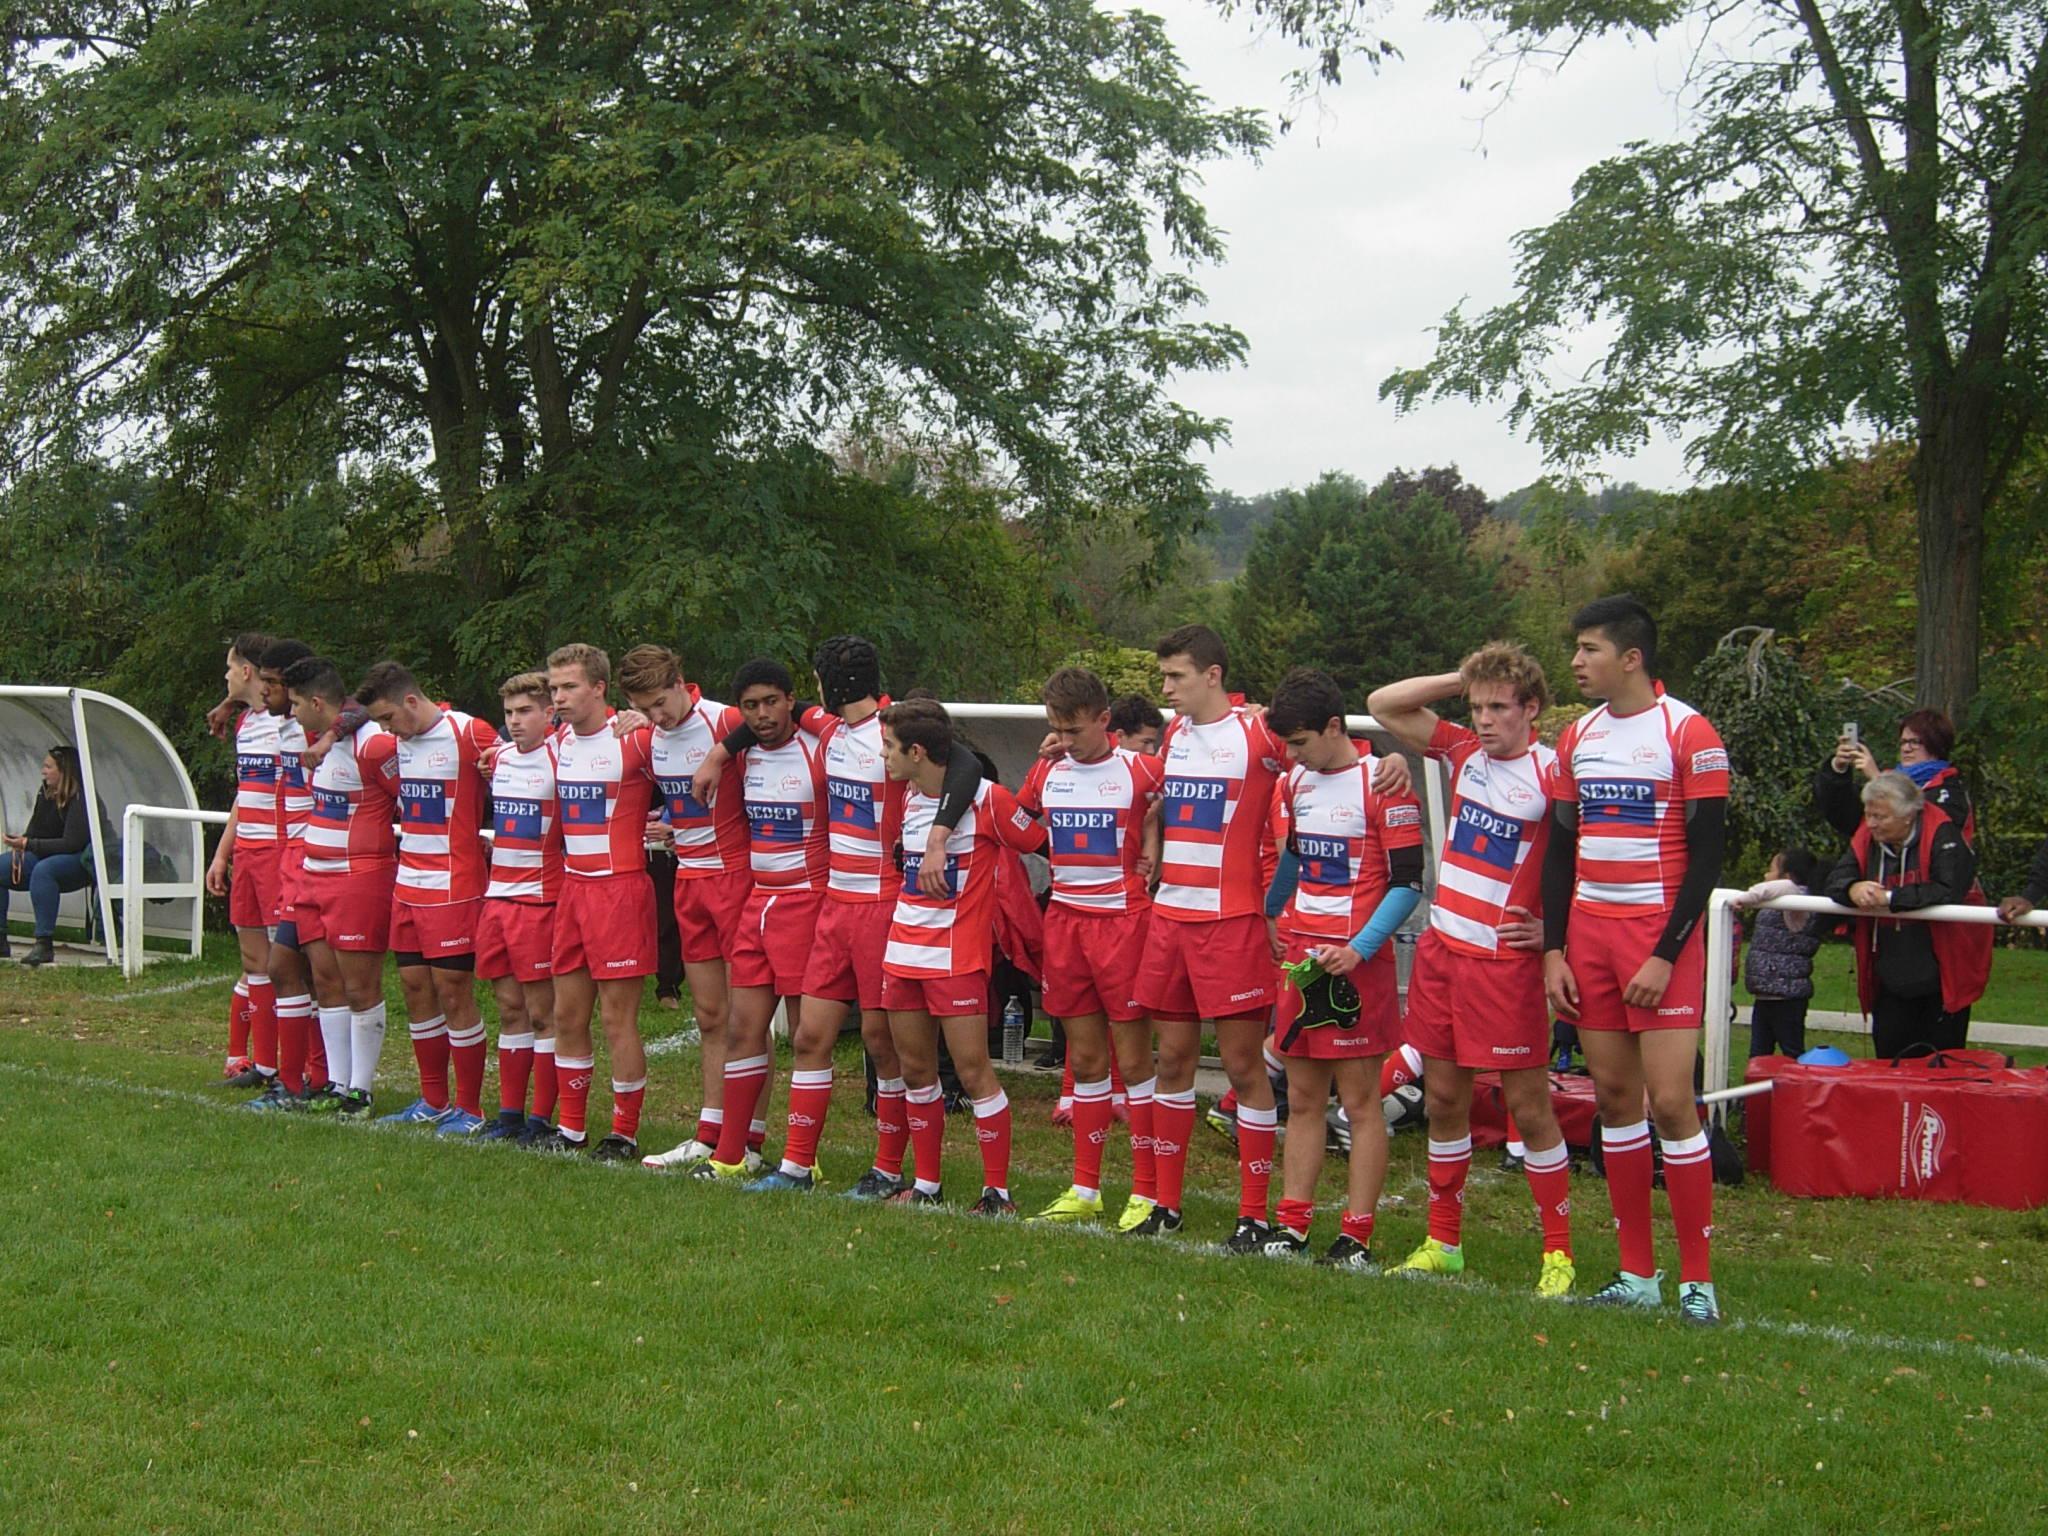 Clamart Rugby 92 -Balandrade Victoire des juniors contre Montesson- dimanche 8 septembre 2017